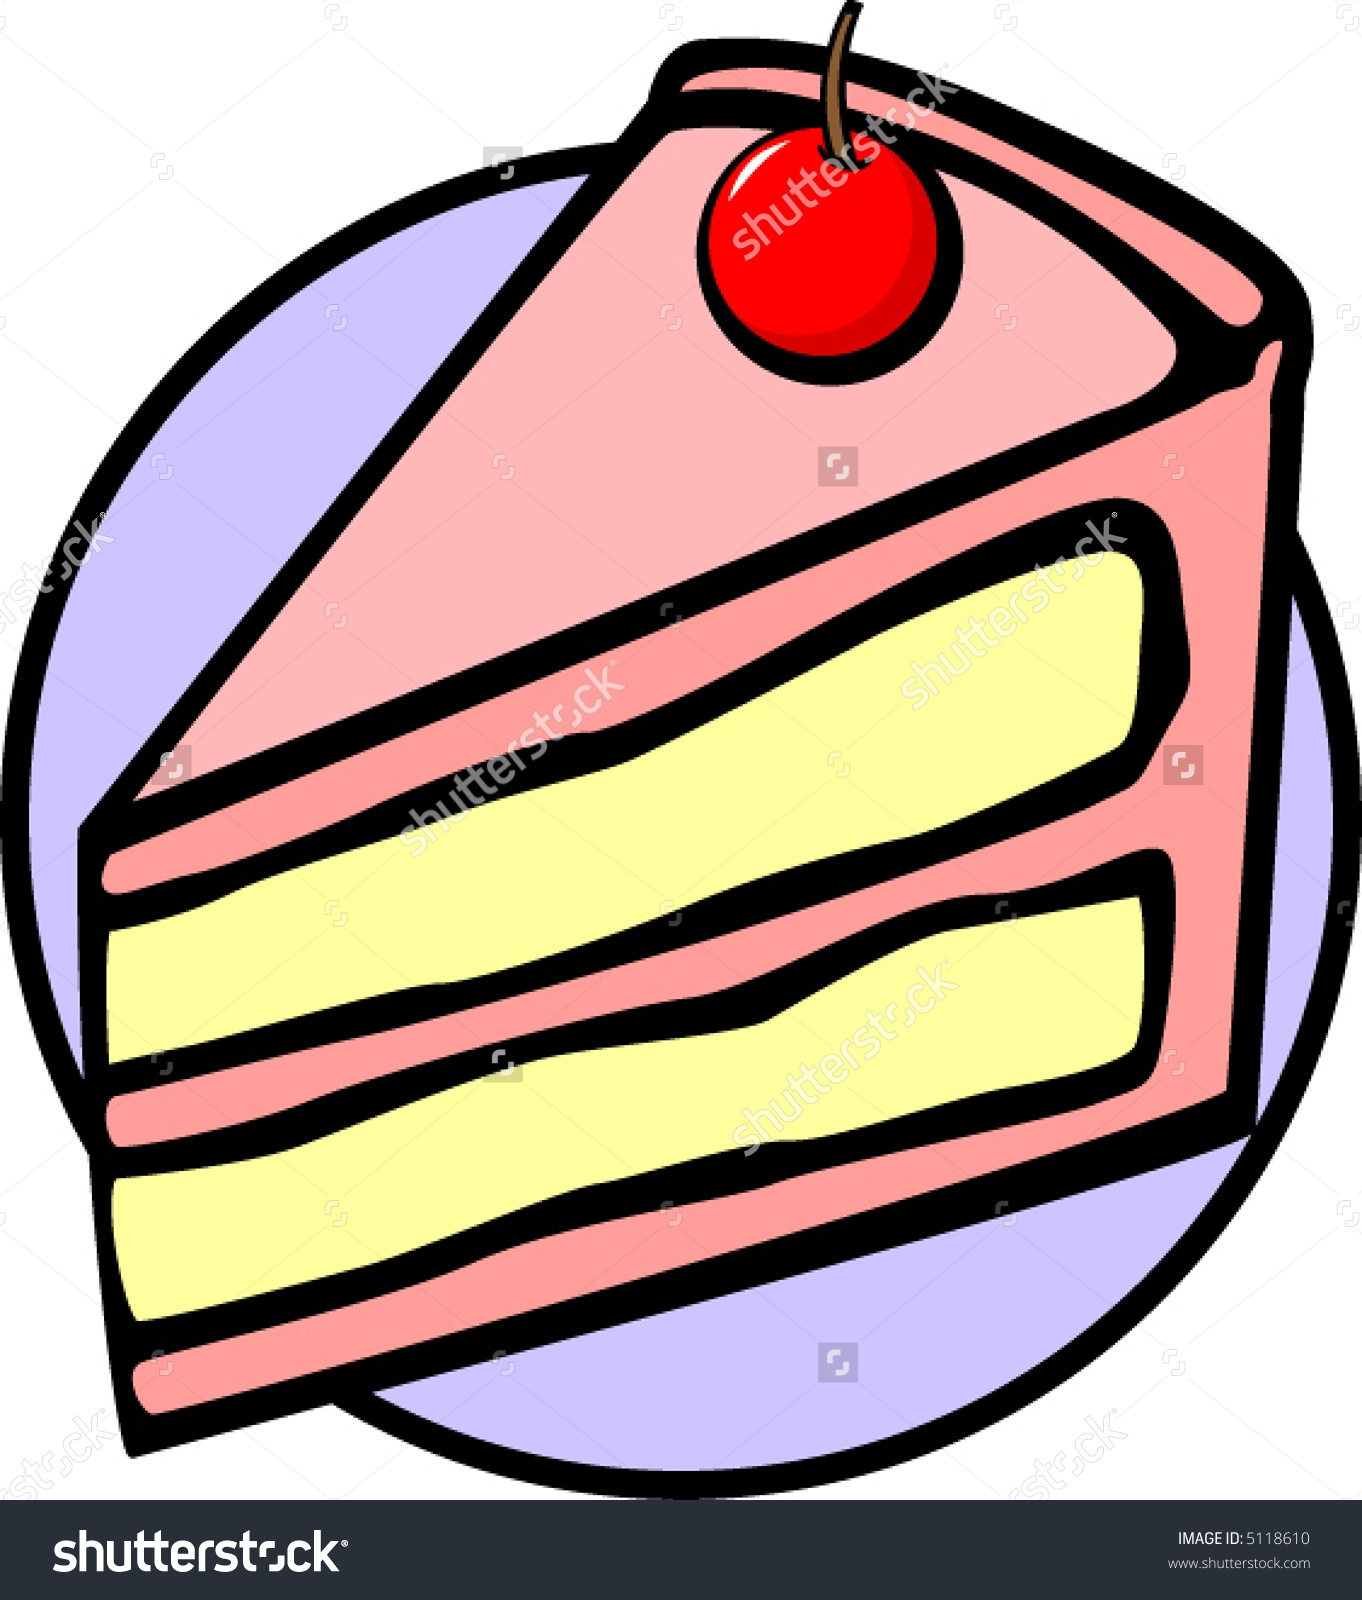 Cake clipart slice svg transparent library Clipart piece of cake - ClipartFest svg transparent library